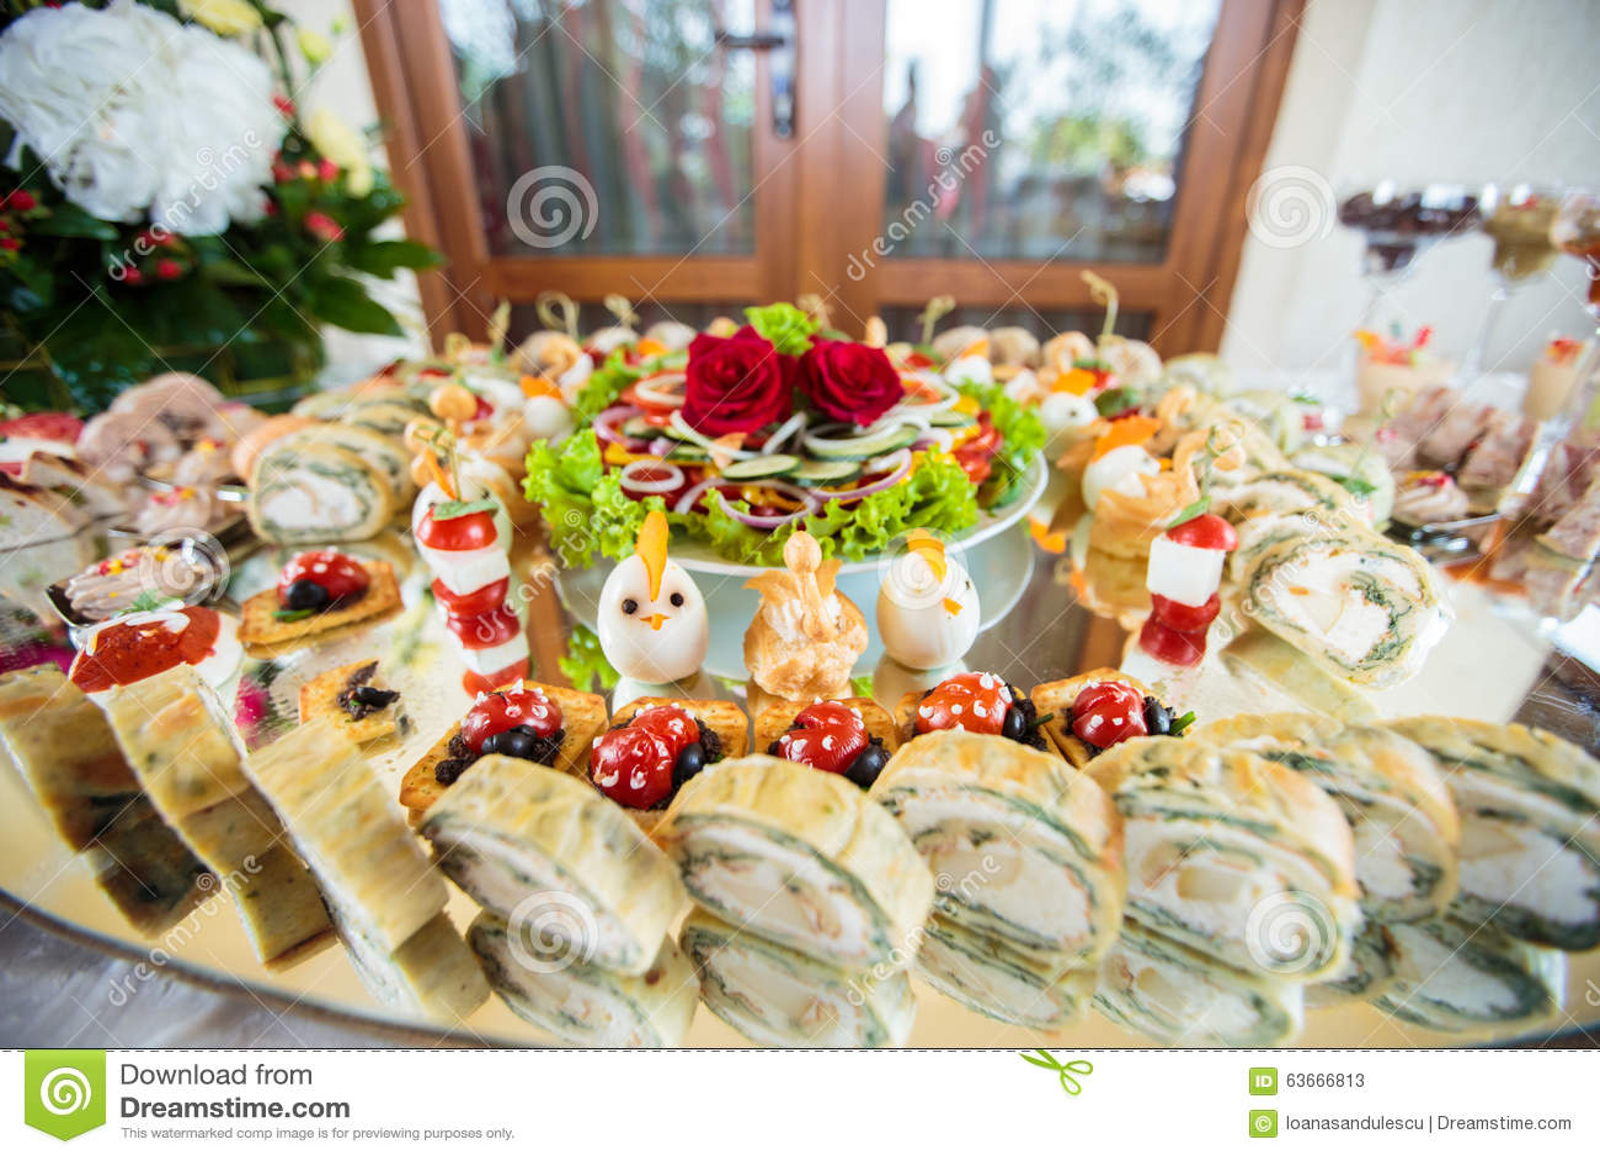 elegant appetizers stock image image of garnish gourmet 63666813